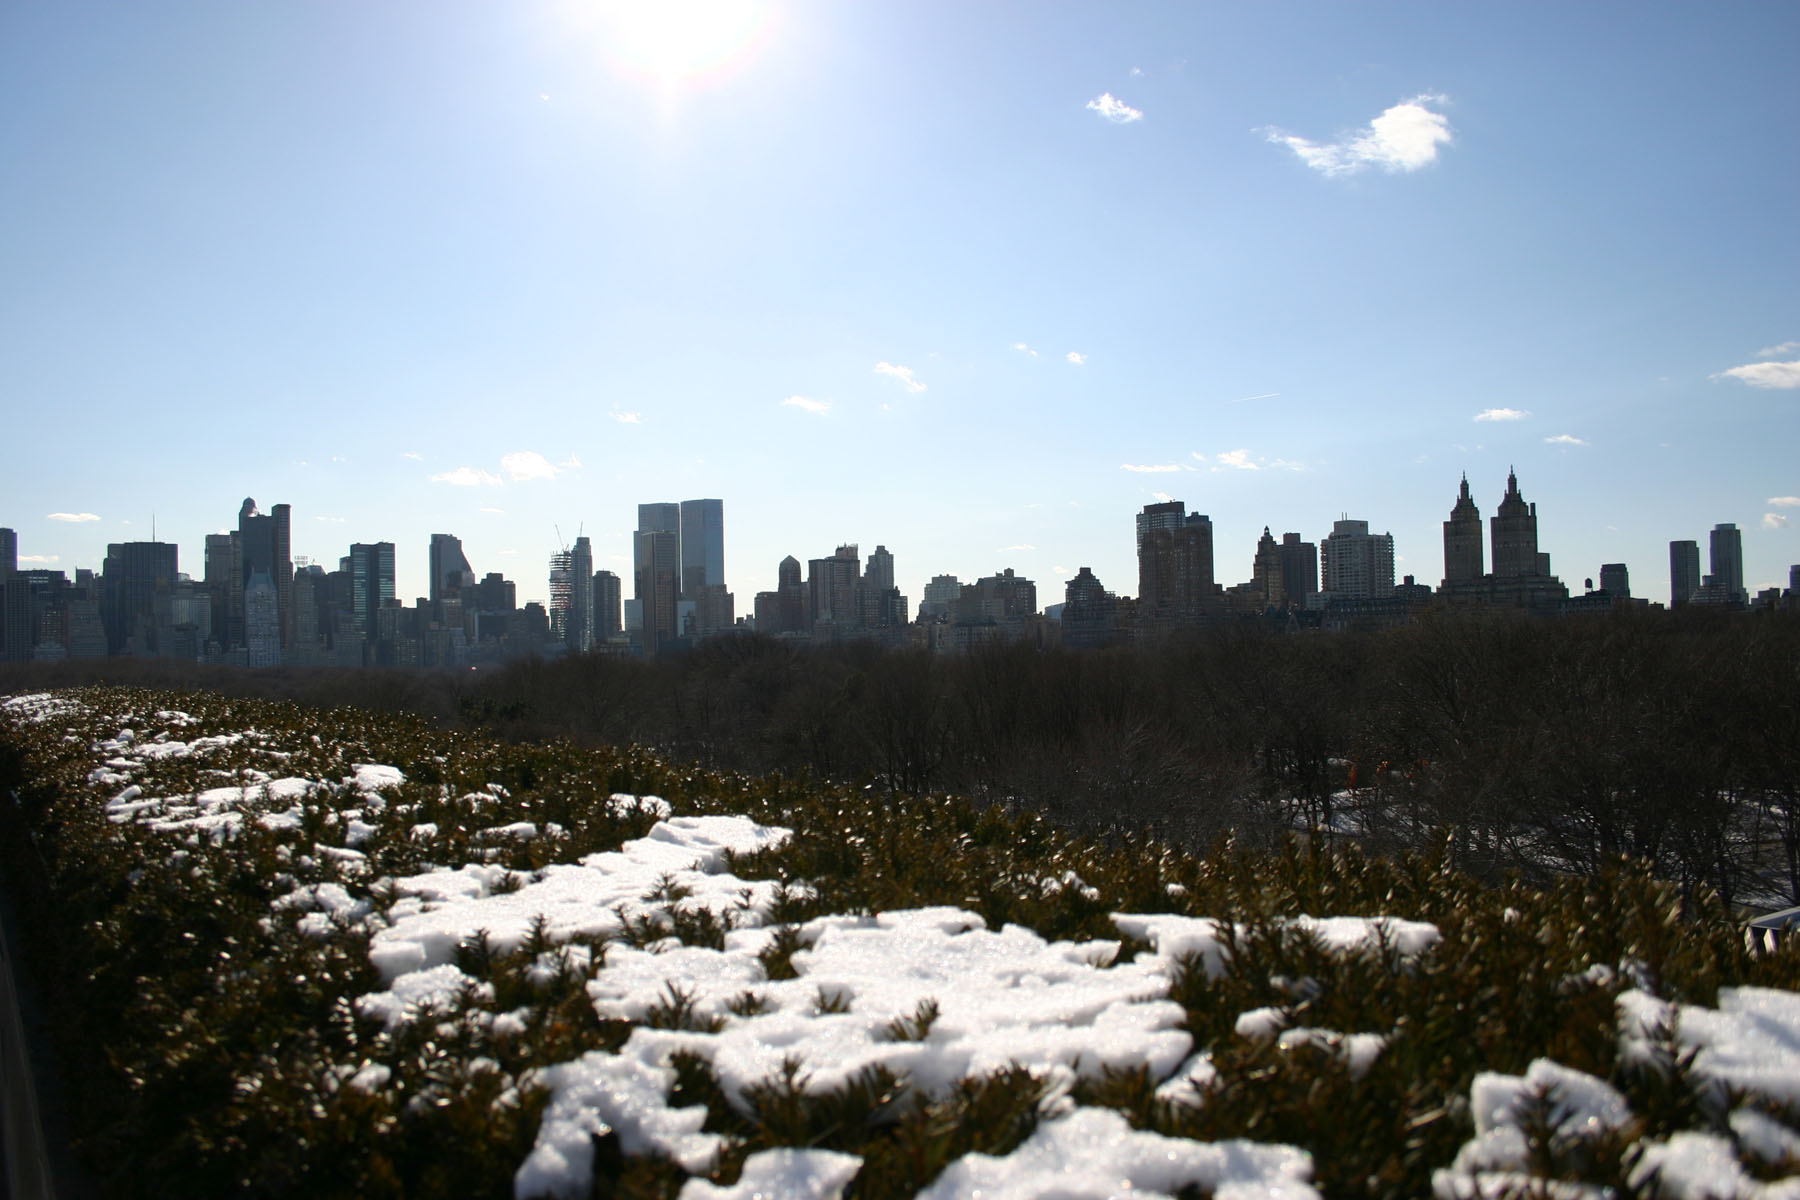 New York City, City, Fall, Newyork, Sky, HQ Photo